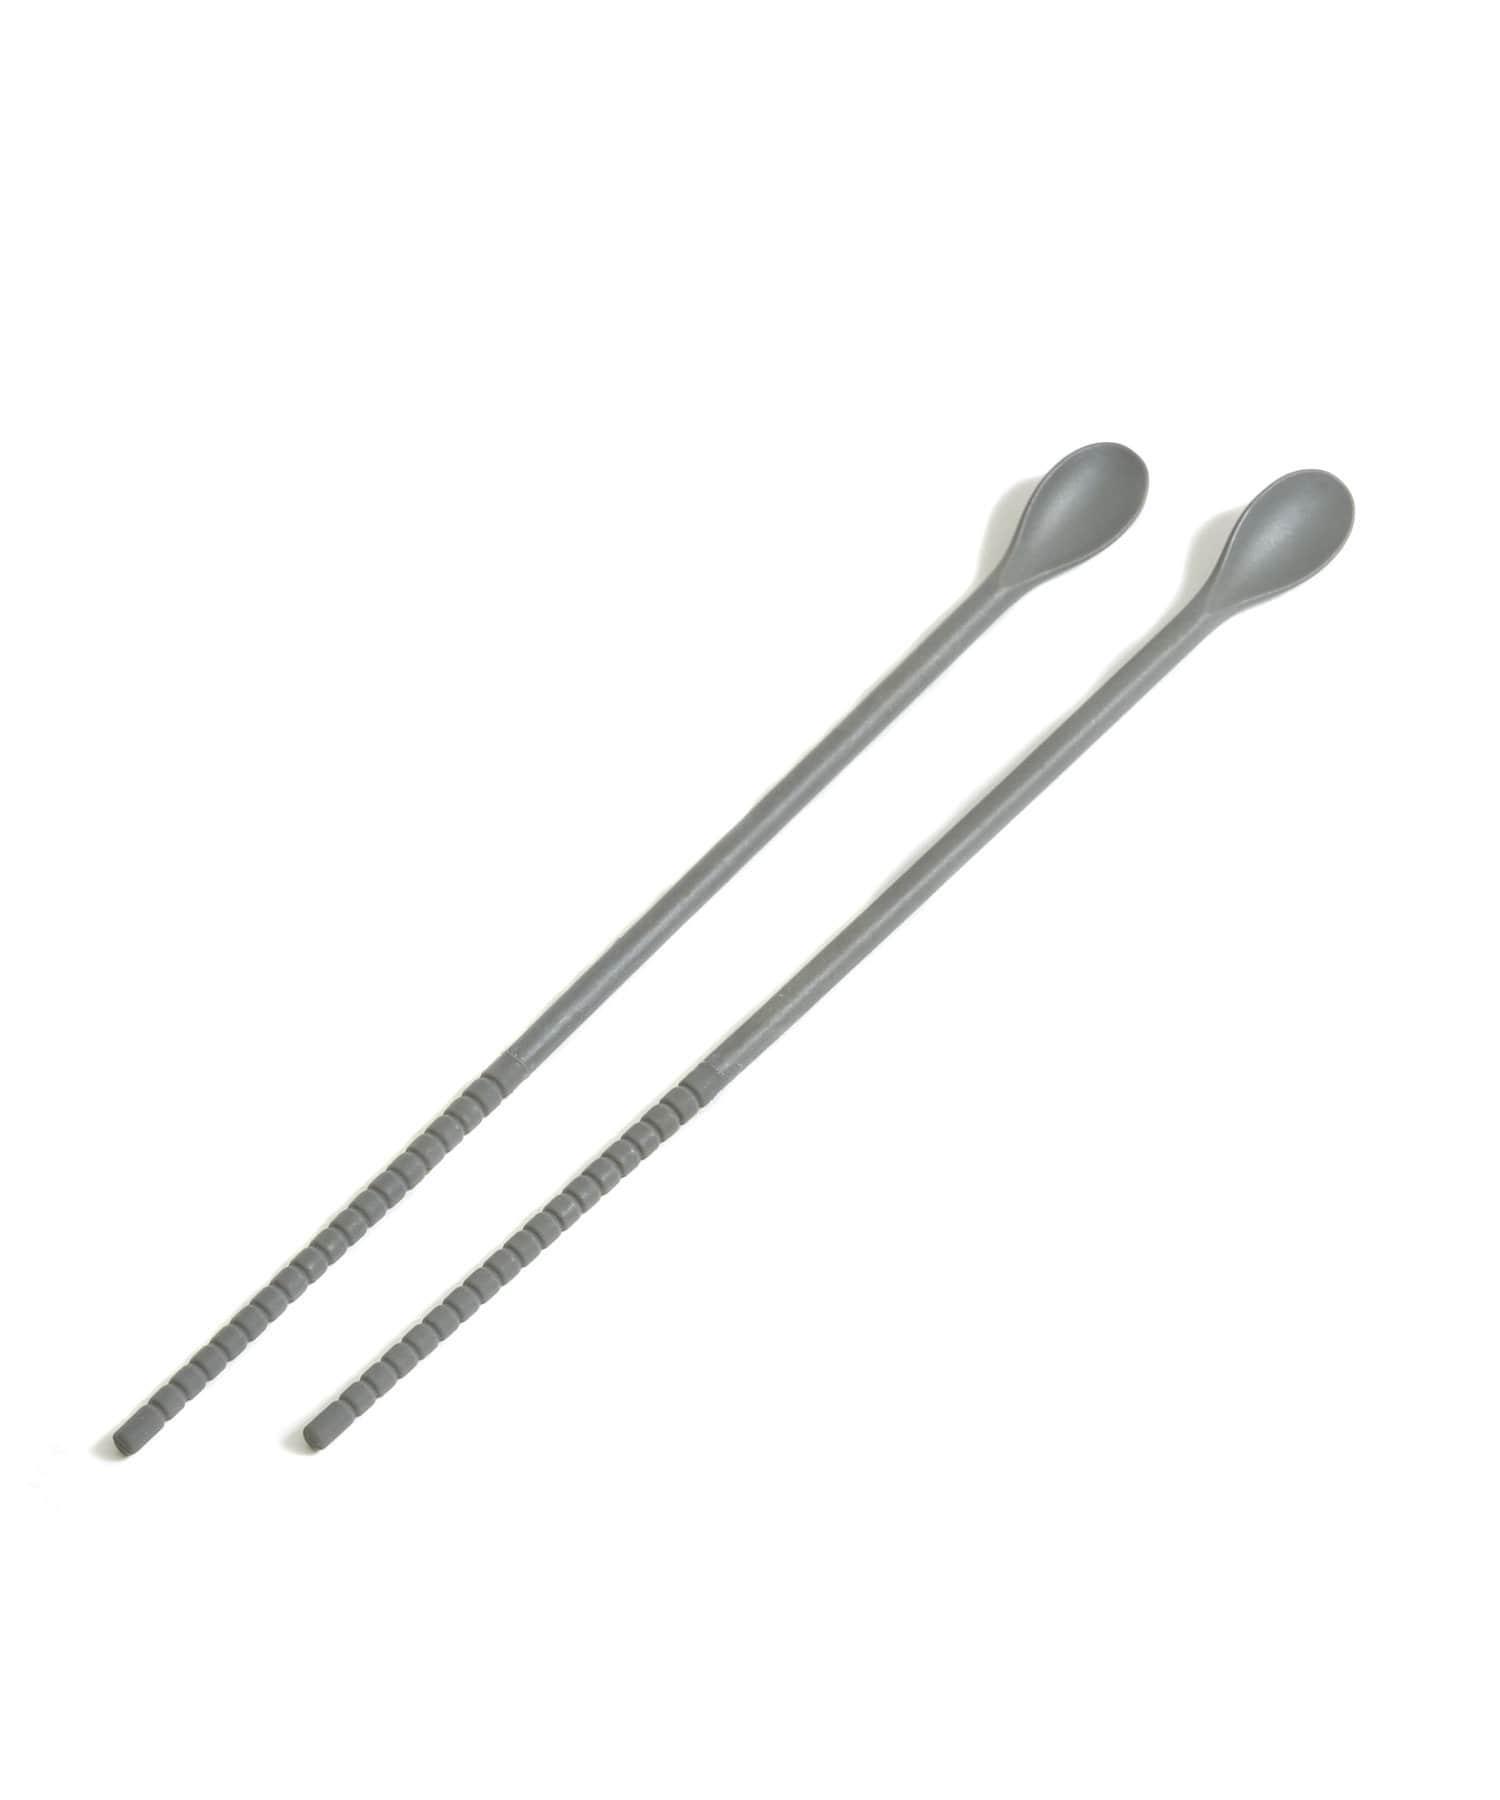 3COINS(スリーコインズ) ライフスタイル 【つくる・そろえる】シリコン菜箸 その他